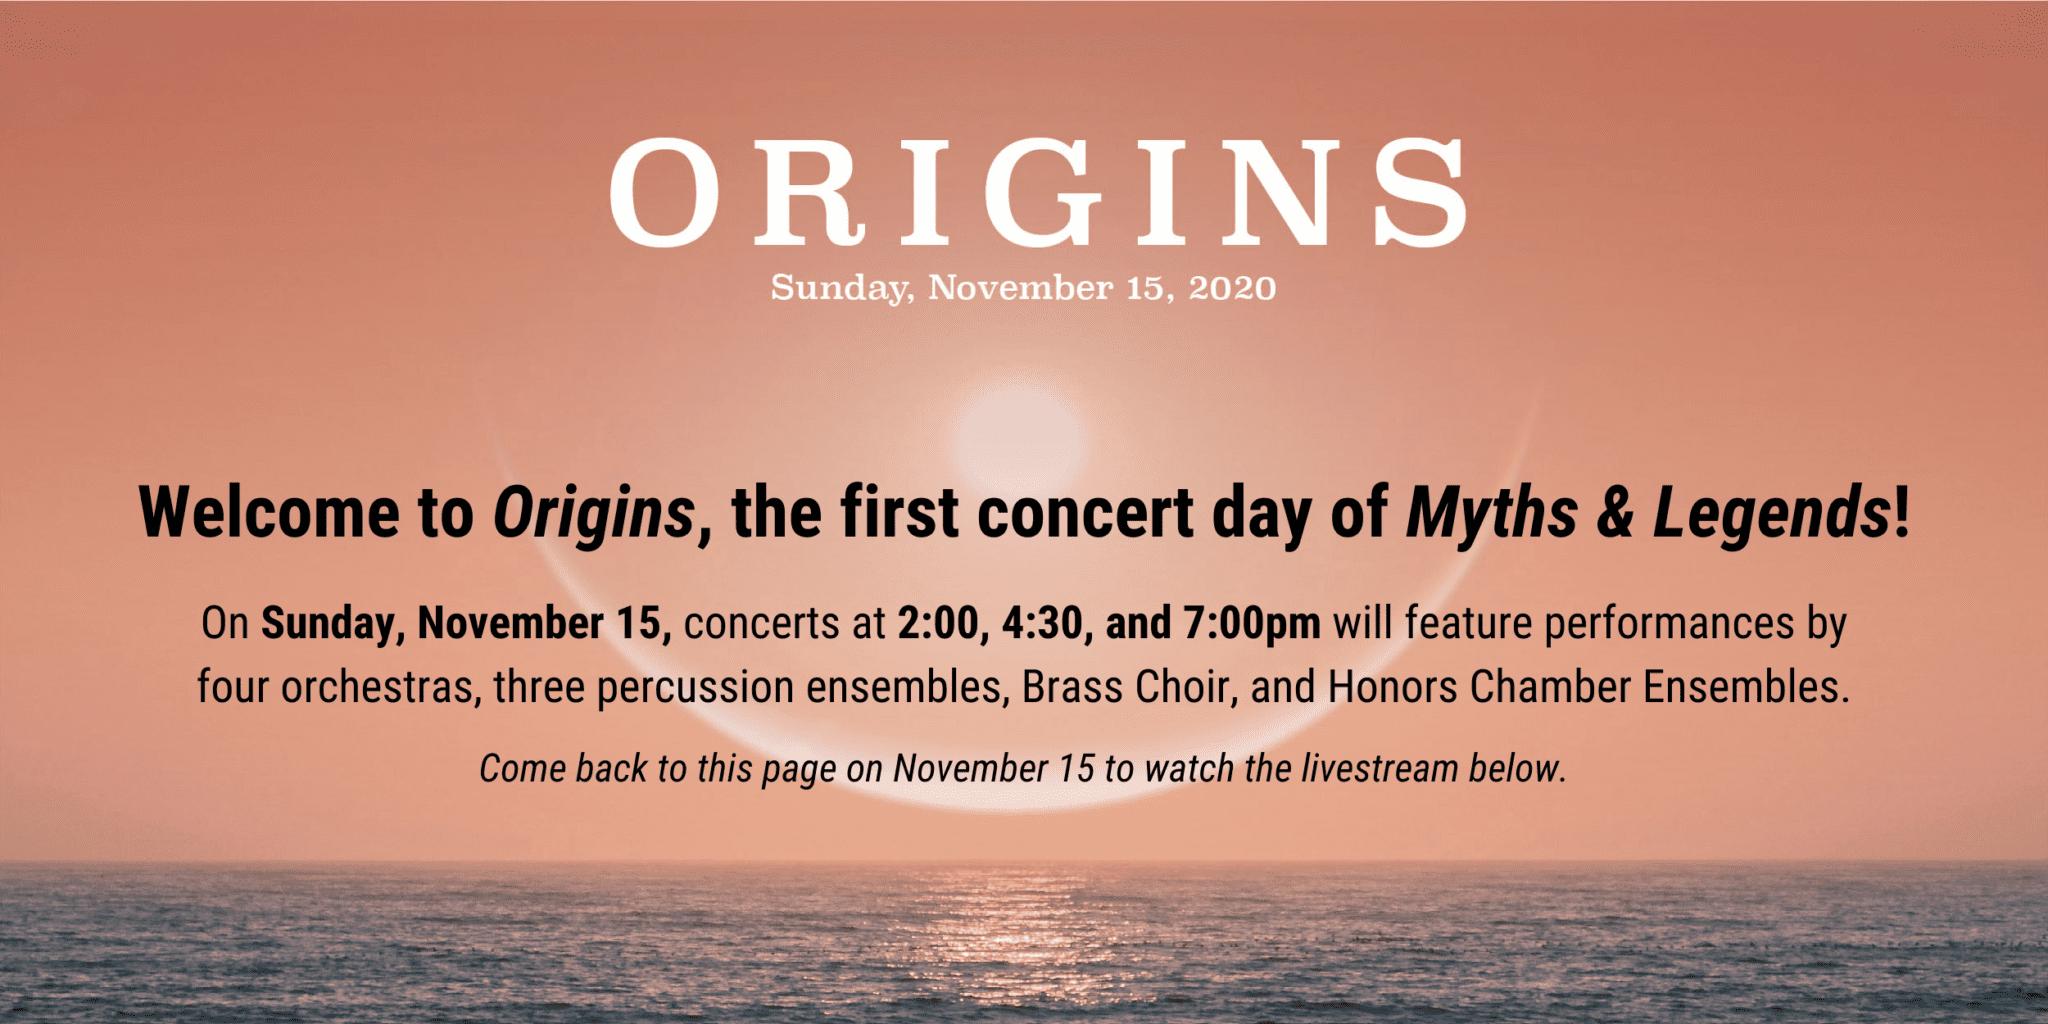 Origins Concert Page Banner 1